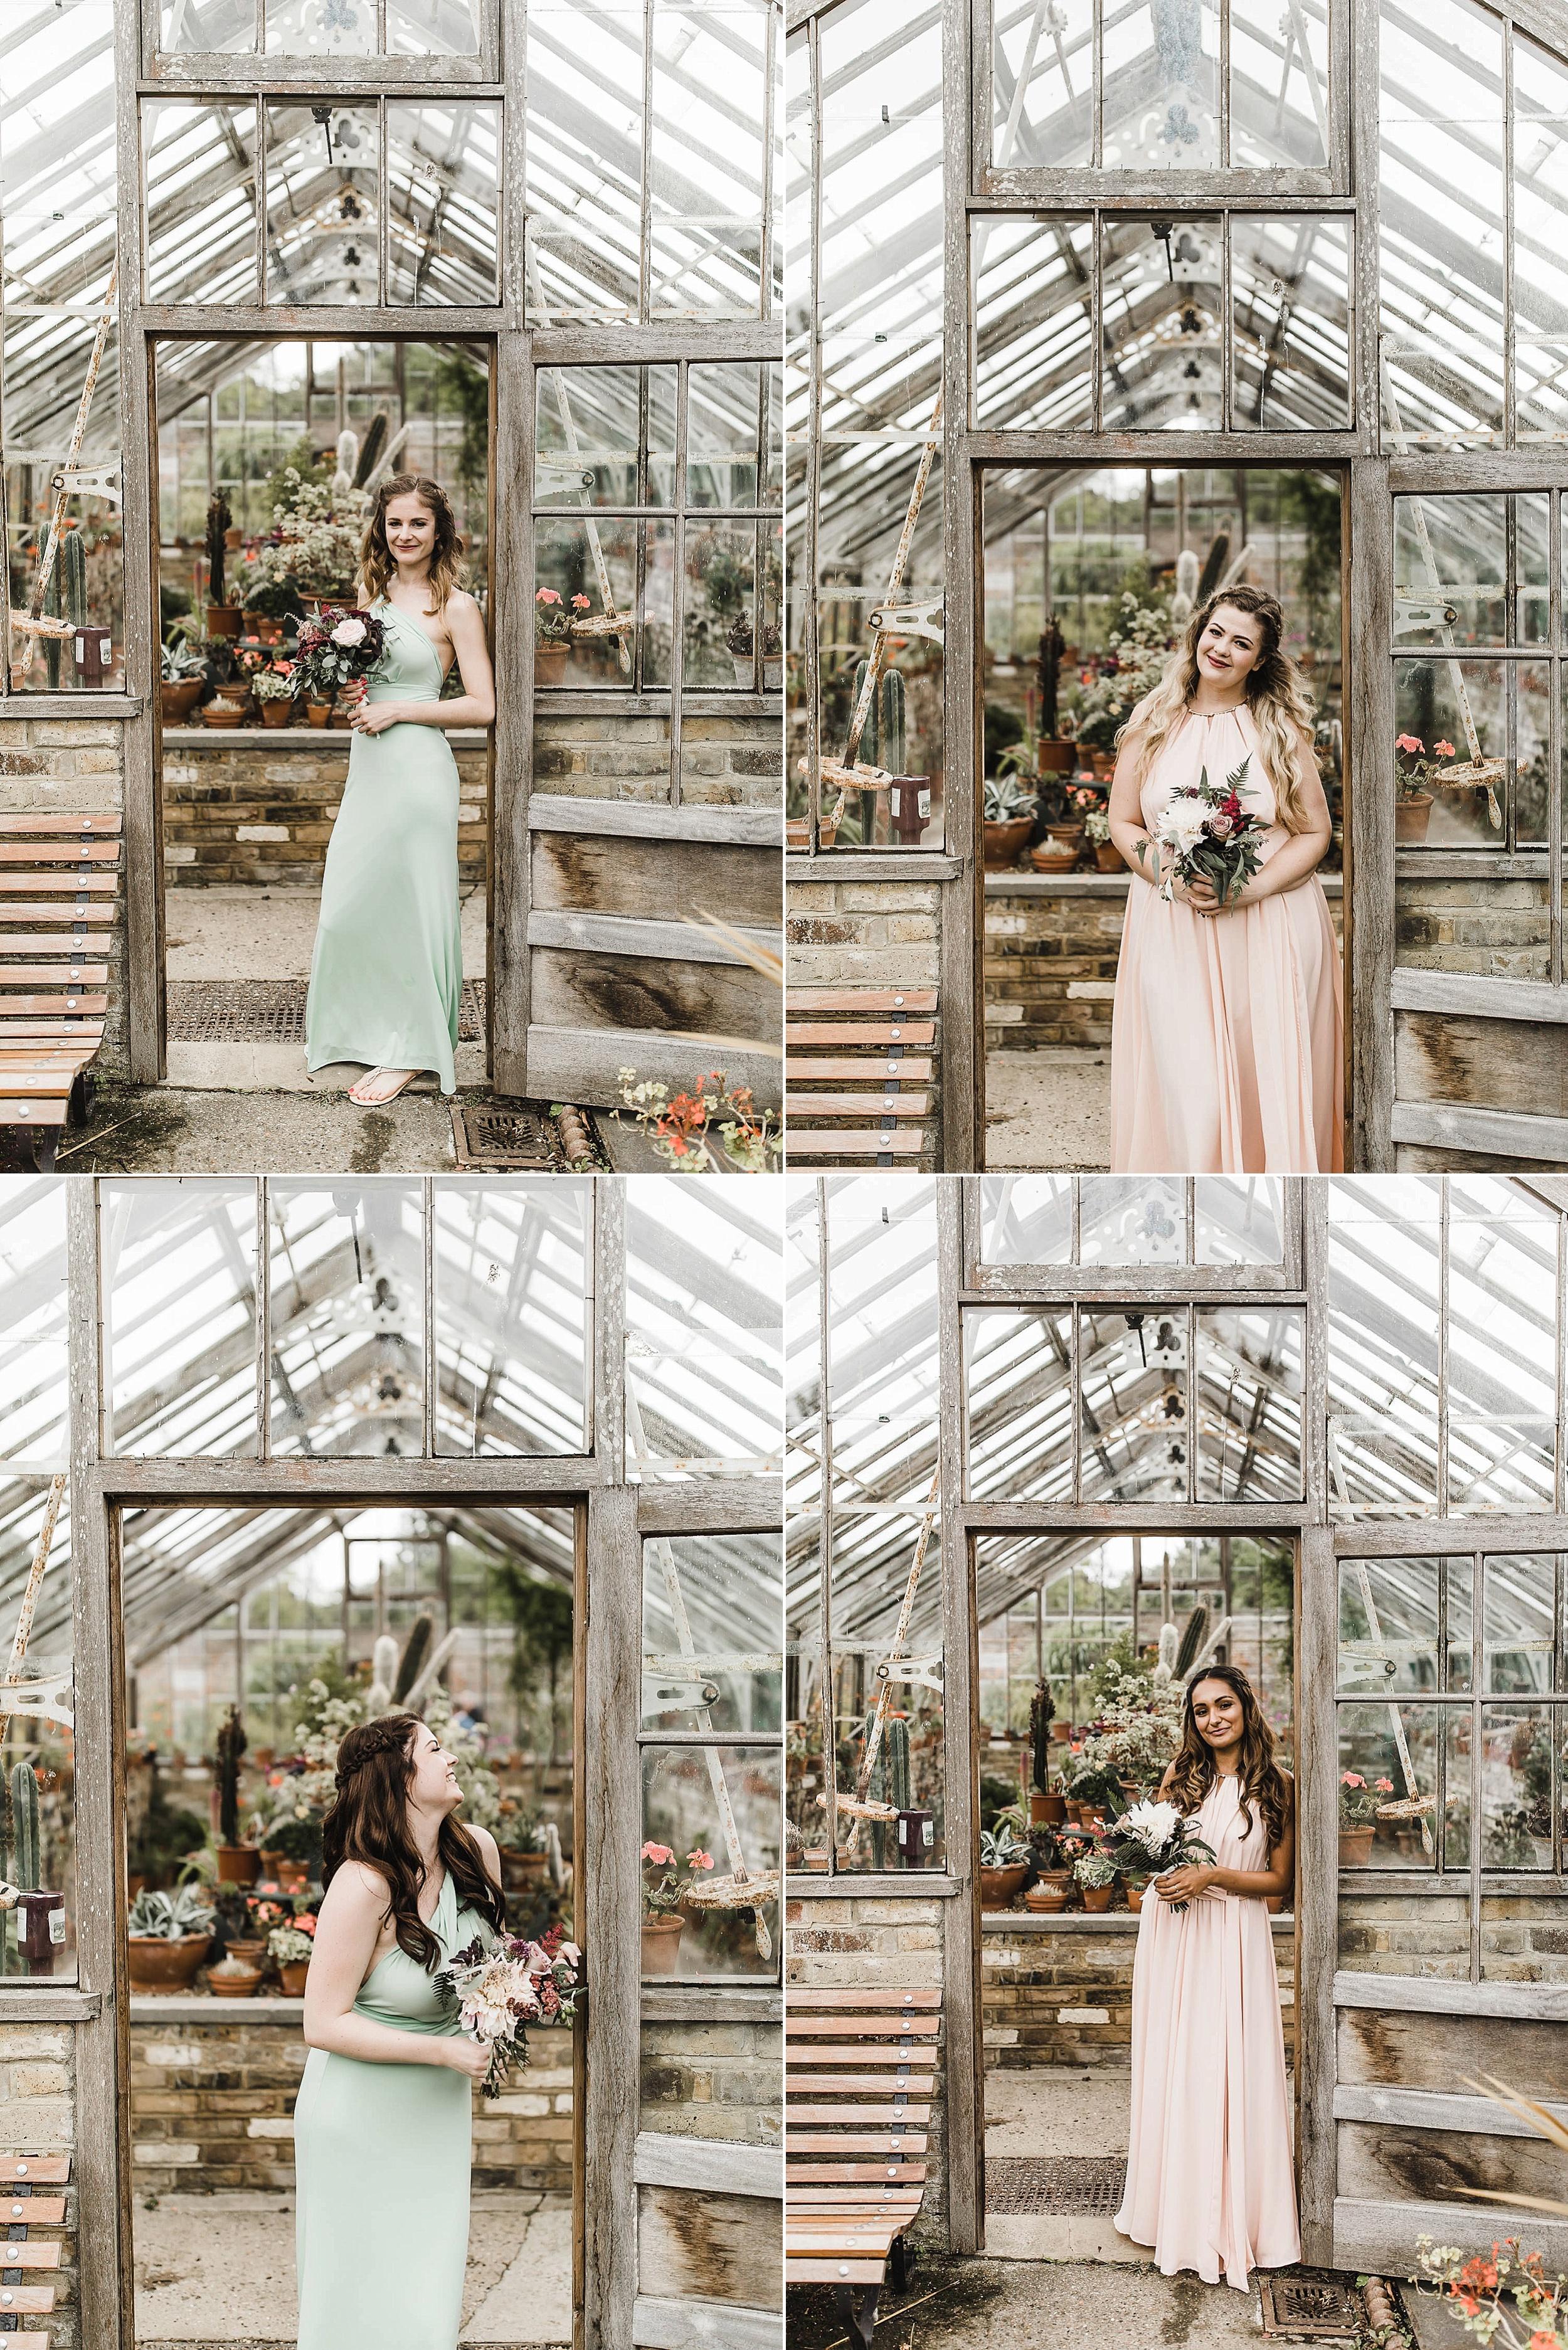 Margate_kent_seaside_fernery_greenhouse_wedding_0057.jpg